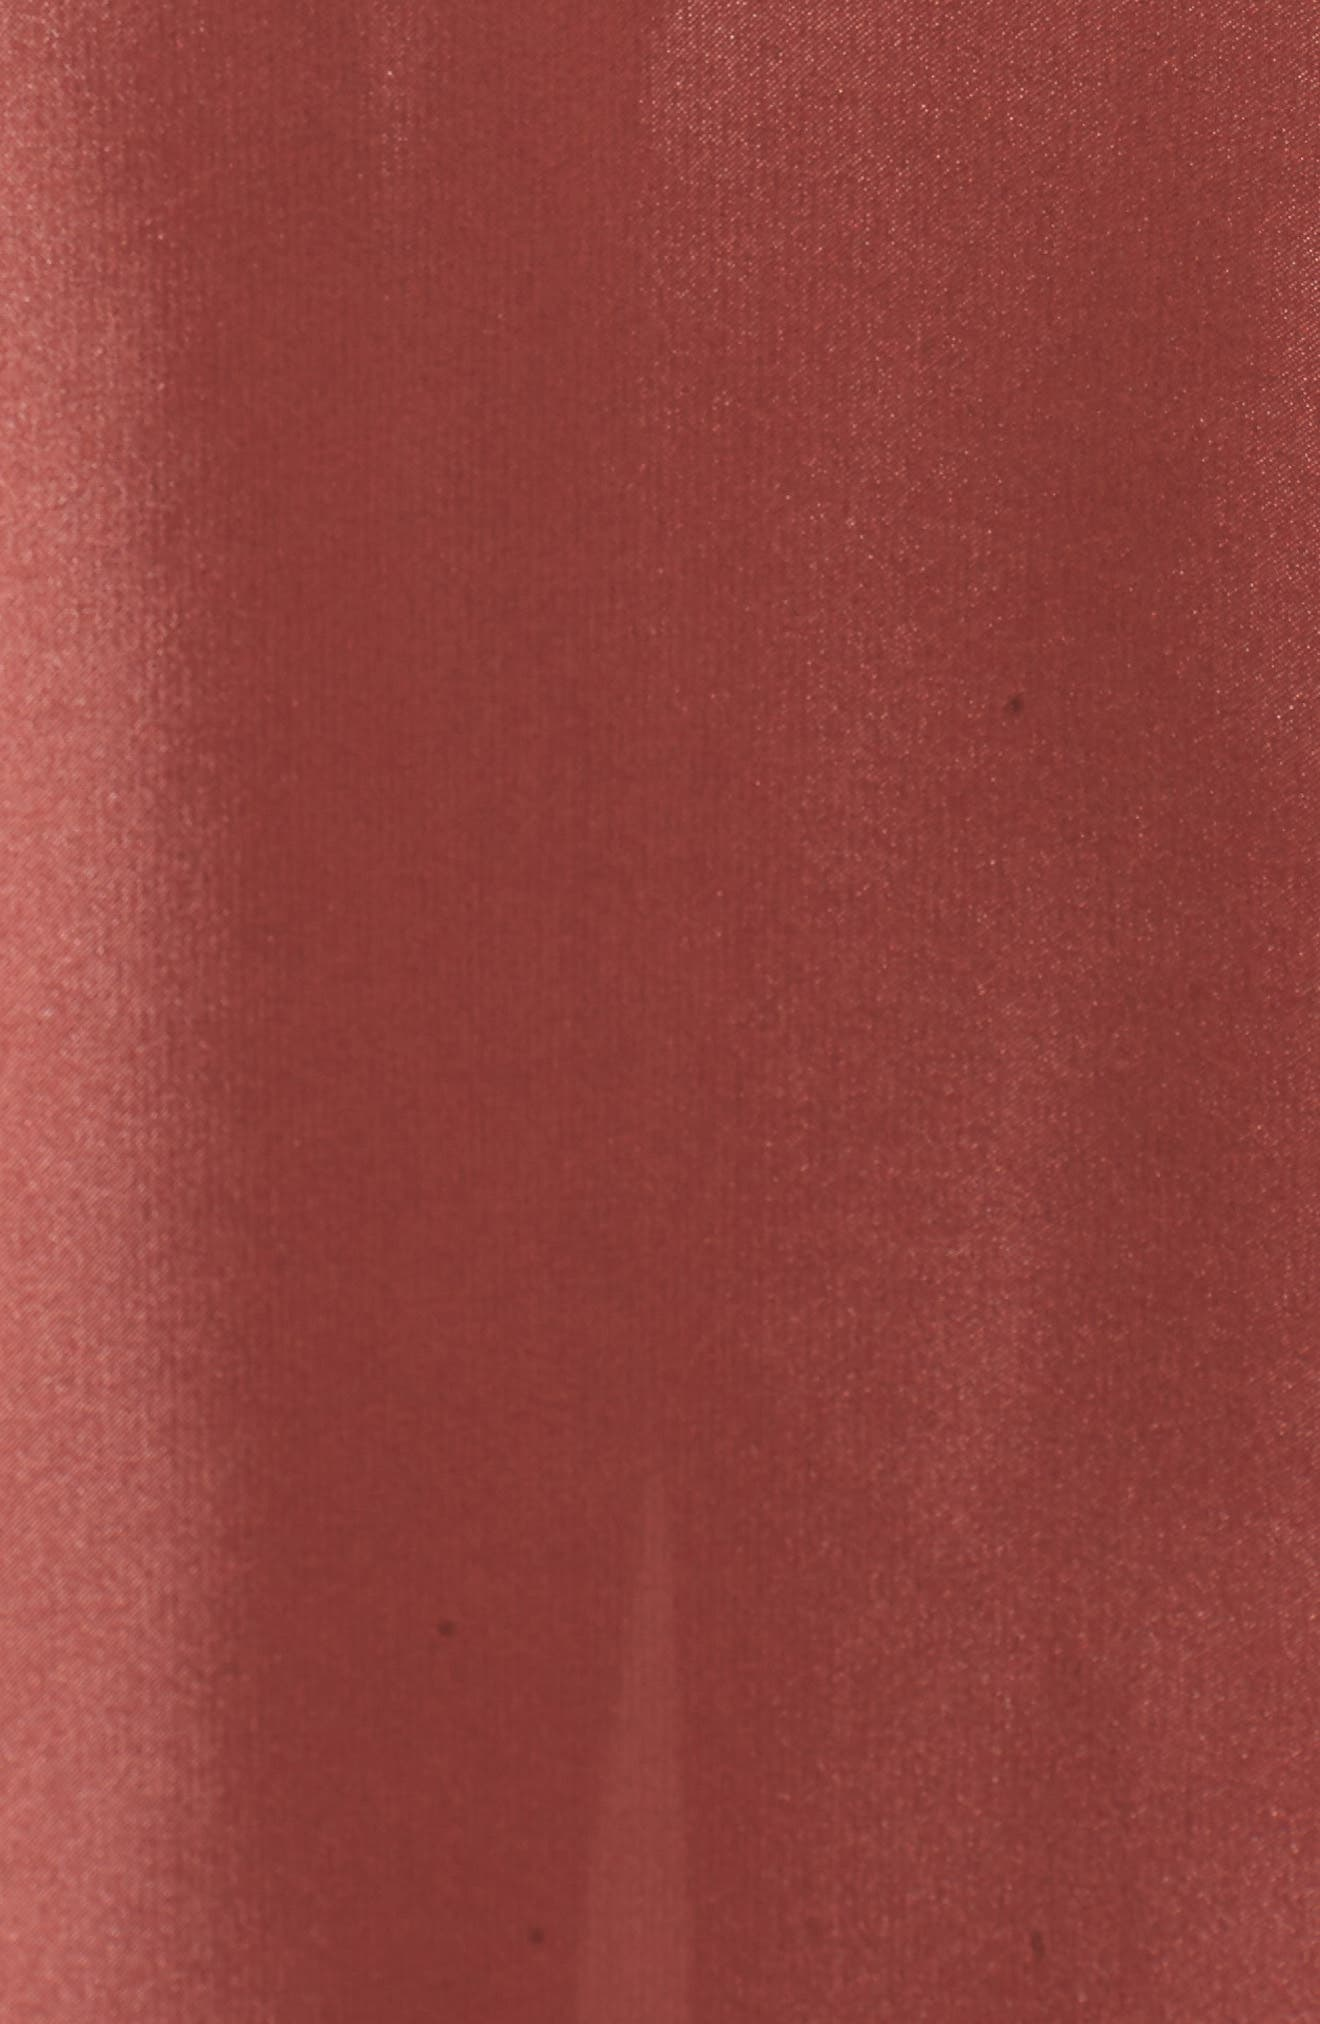 Icy Shores Maxi Dress,                             Alternate thumbnail 5, color,                             903